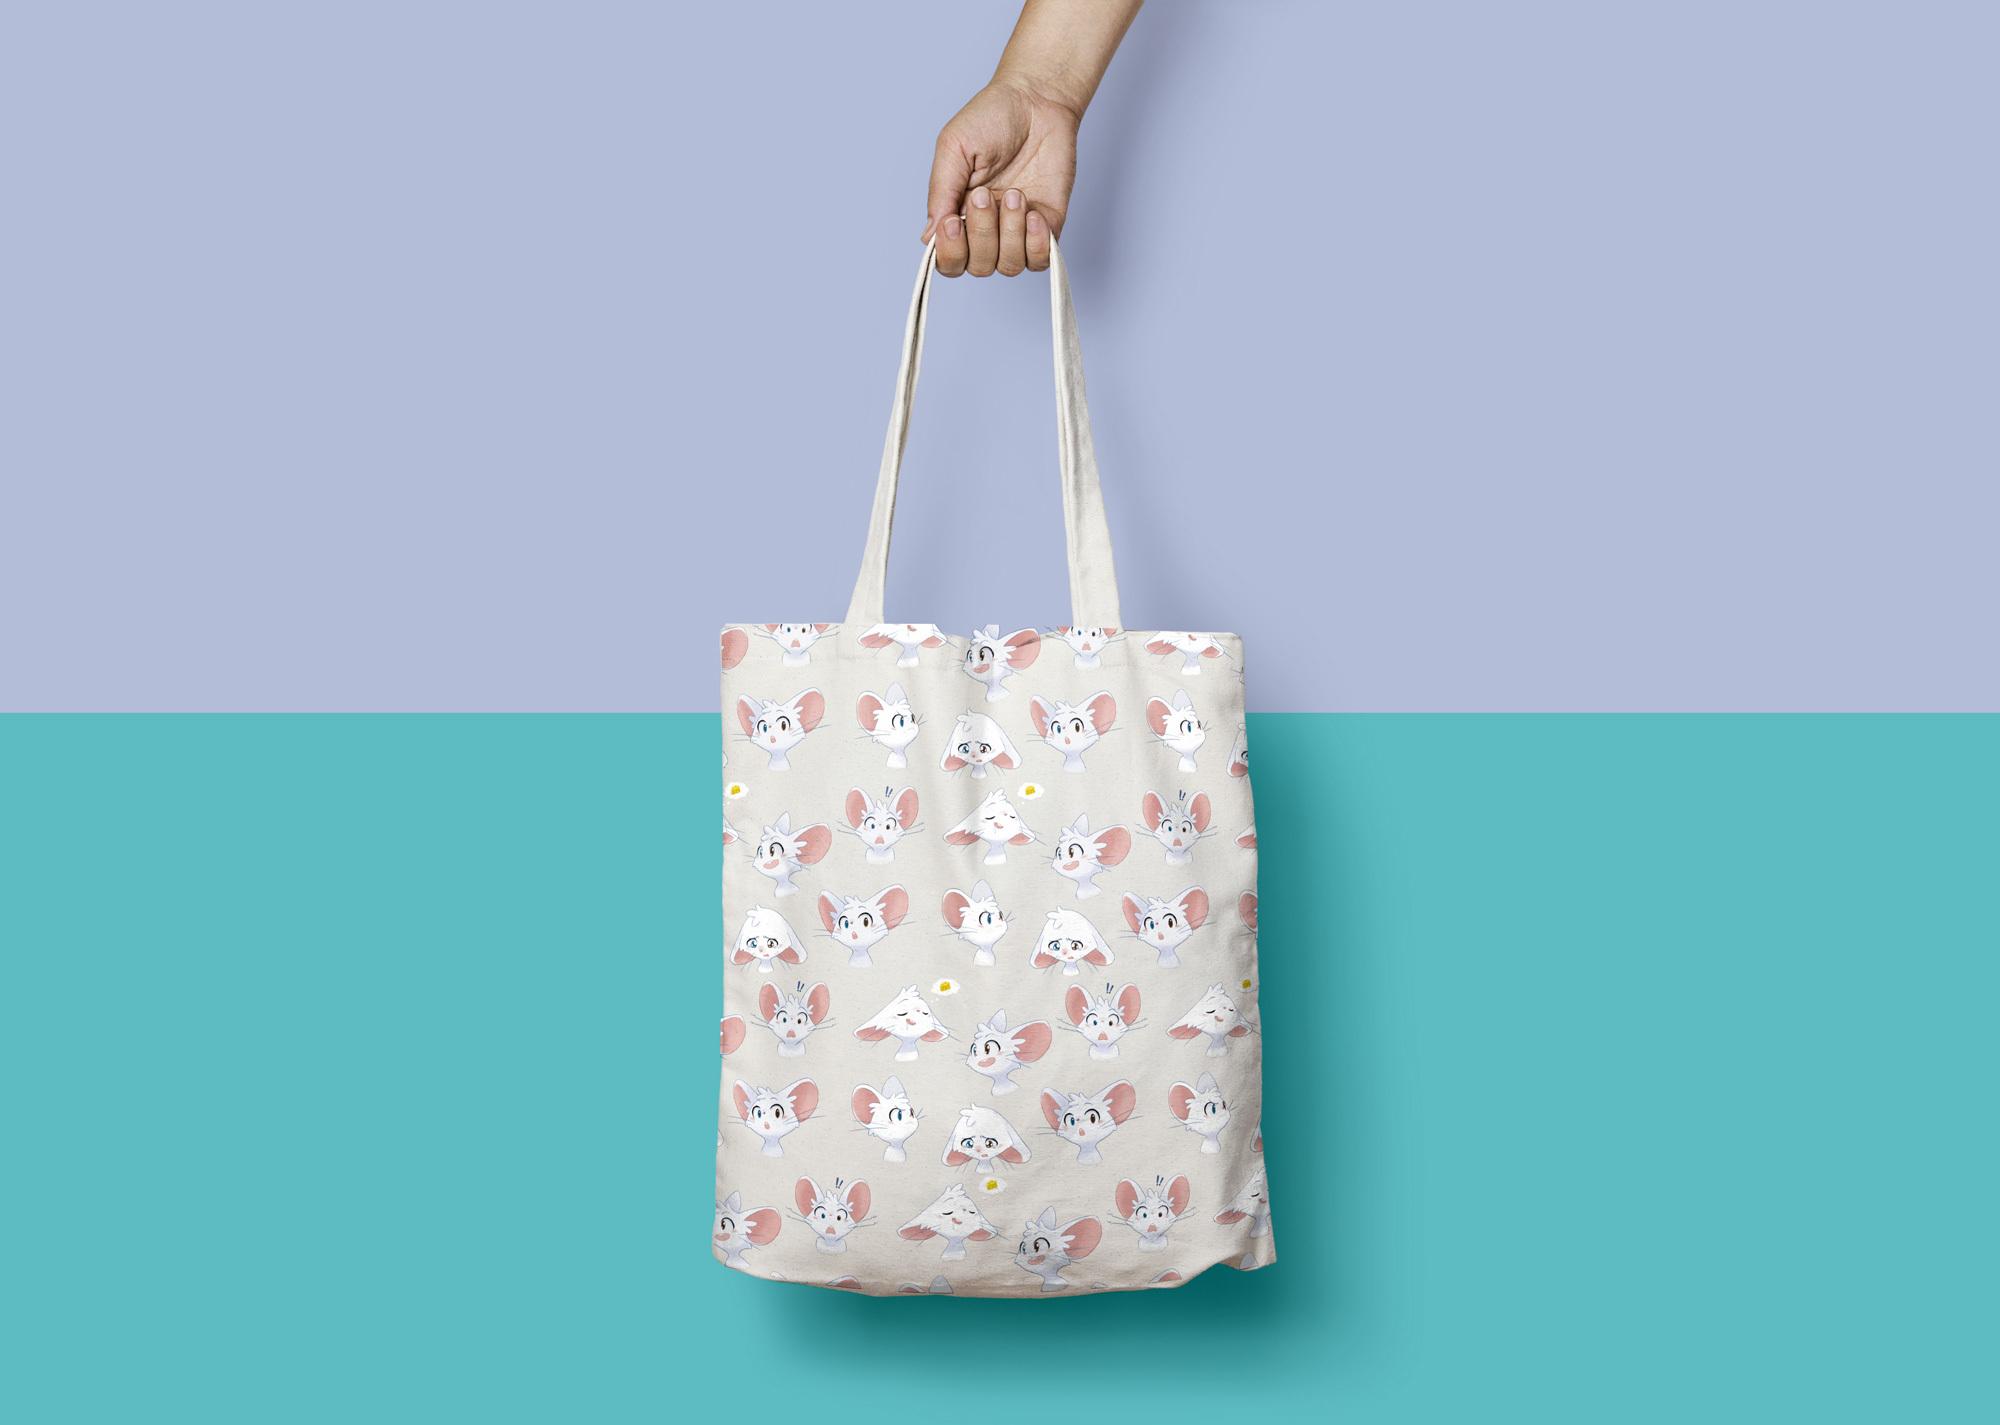 Canvas Tote Bag Mock Up